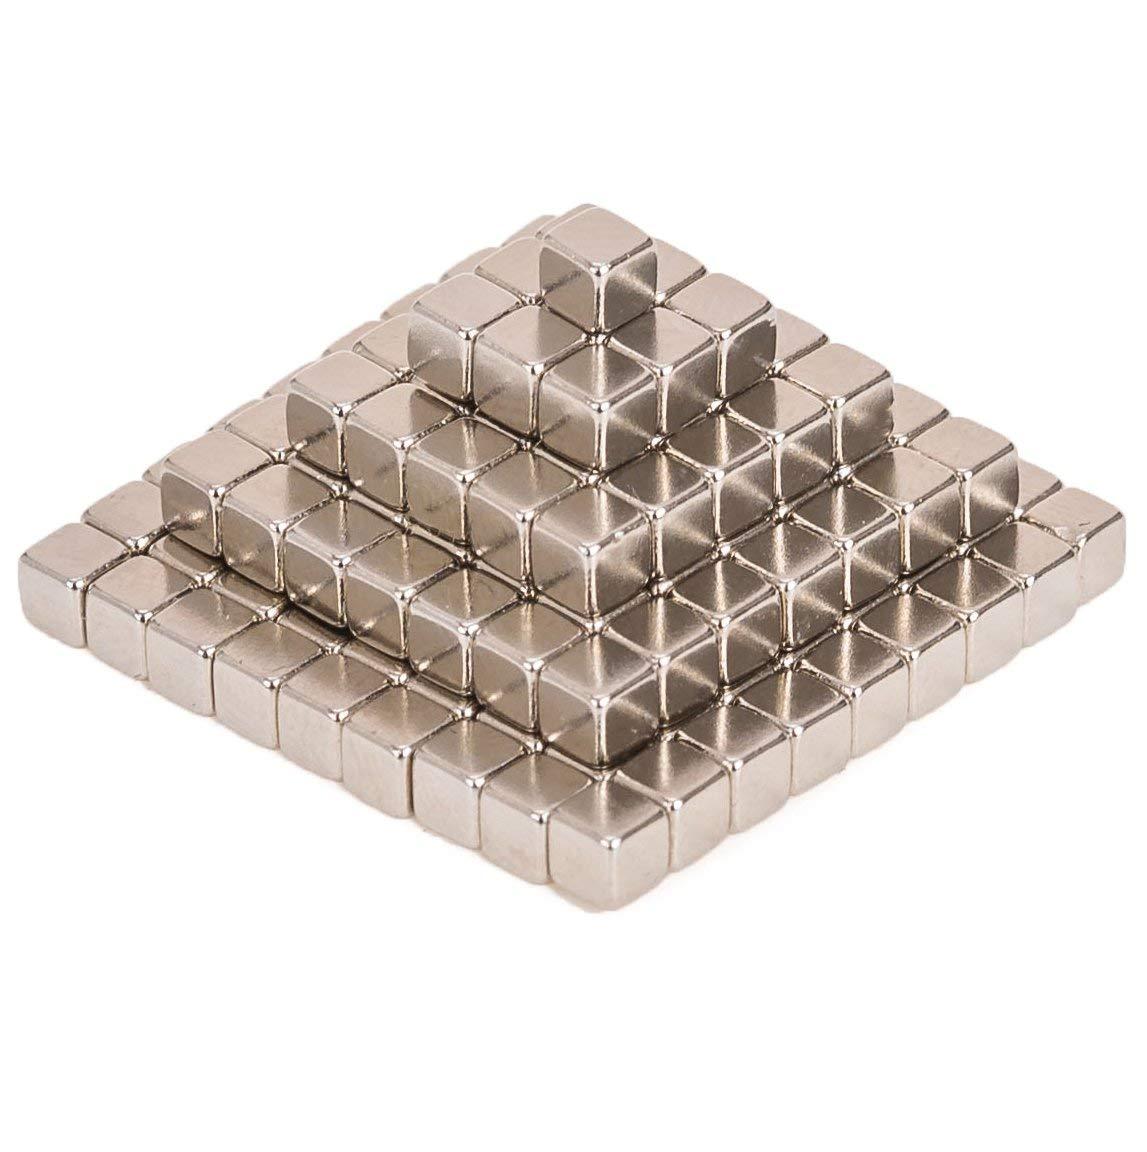 Mayli Magnet Balls 3mm//5mm Magnets Blocks Fidget Cube Magnet Cube Magnet Sculpture Cube Stress Relief Toys Puzzle Magic Educational Toys 3mm 216 Pcs Silver Square Shape